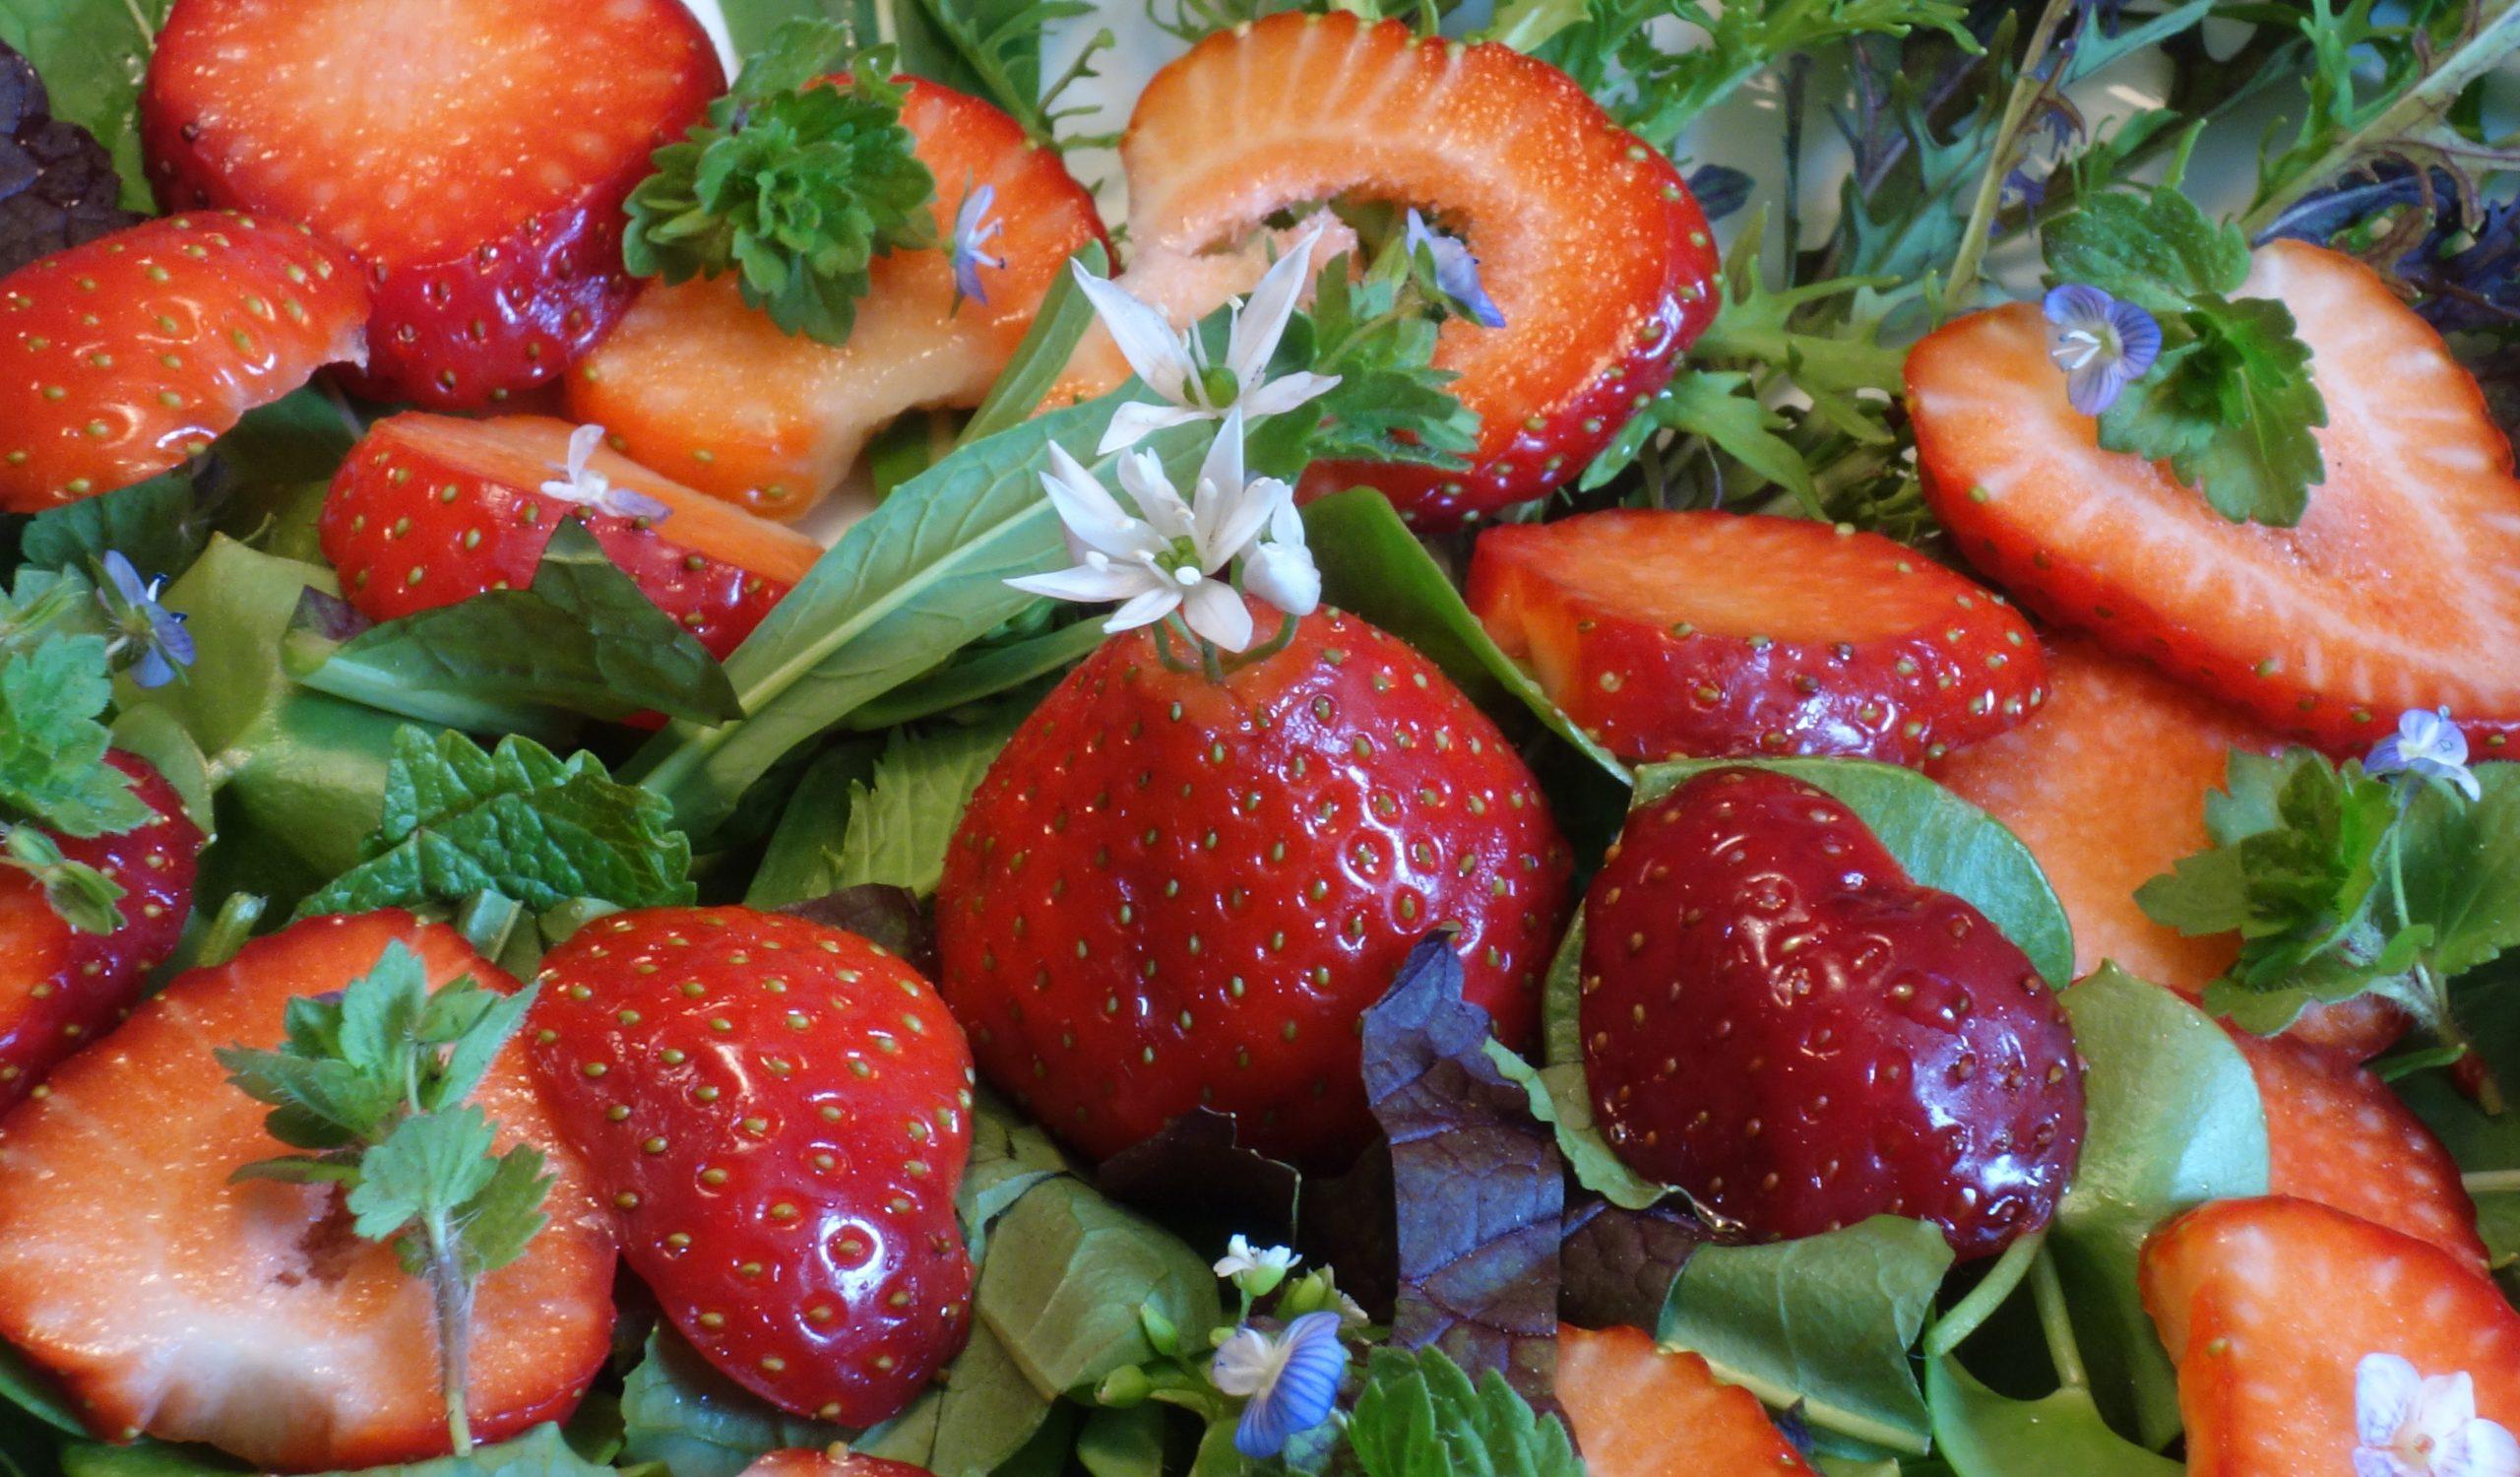 Wildkräutersalat mit Erdbeeren